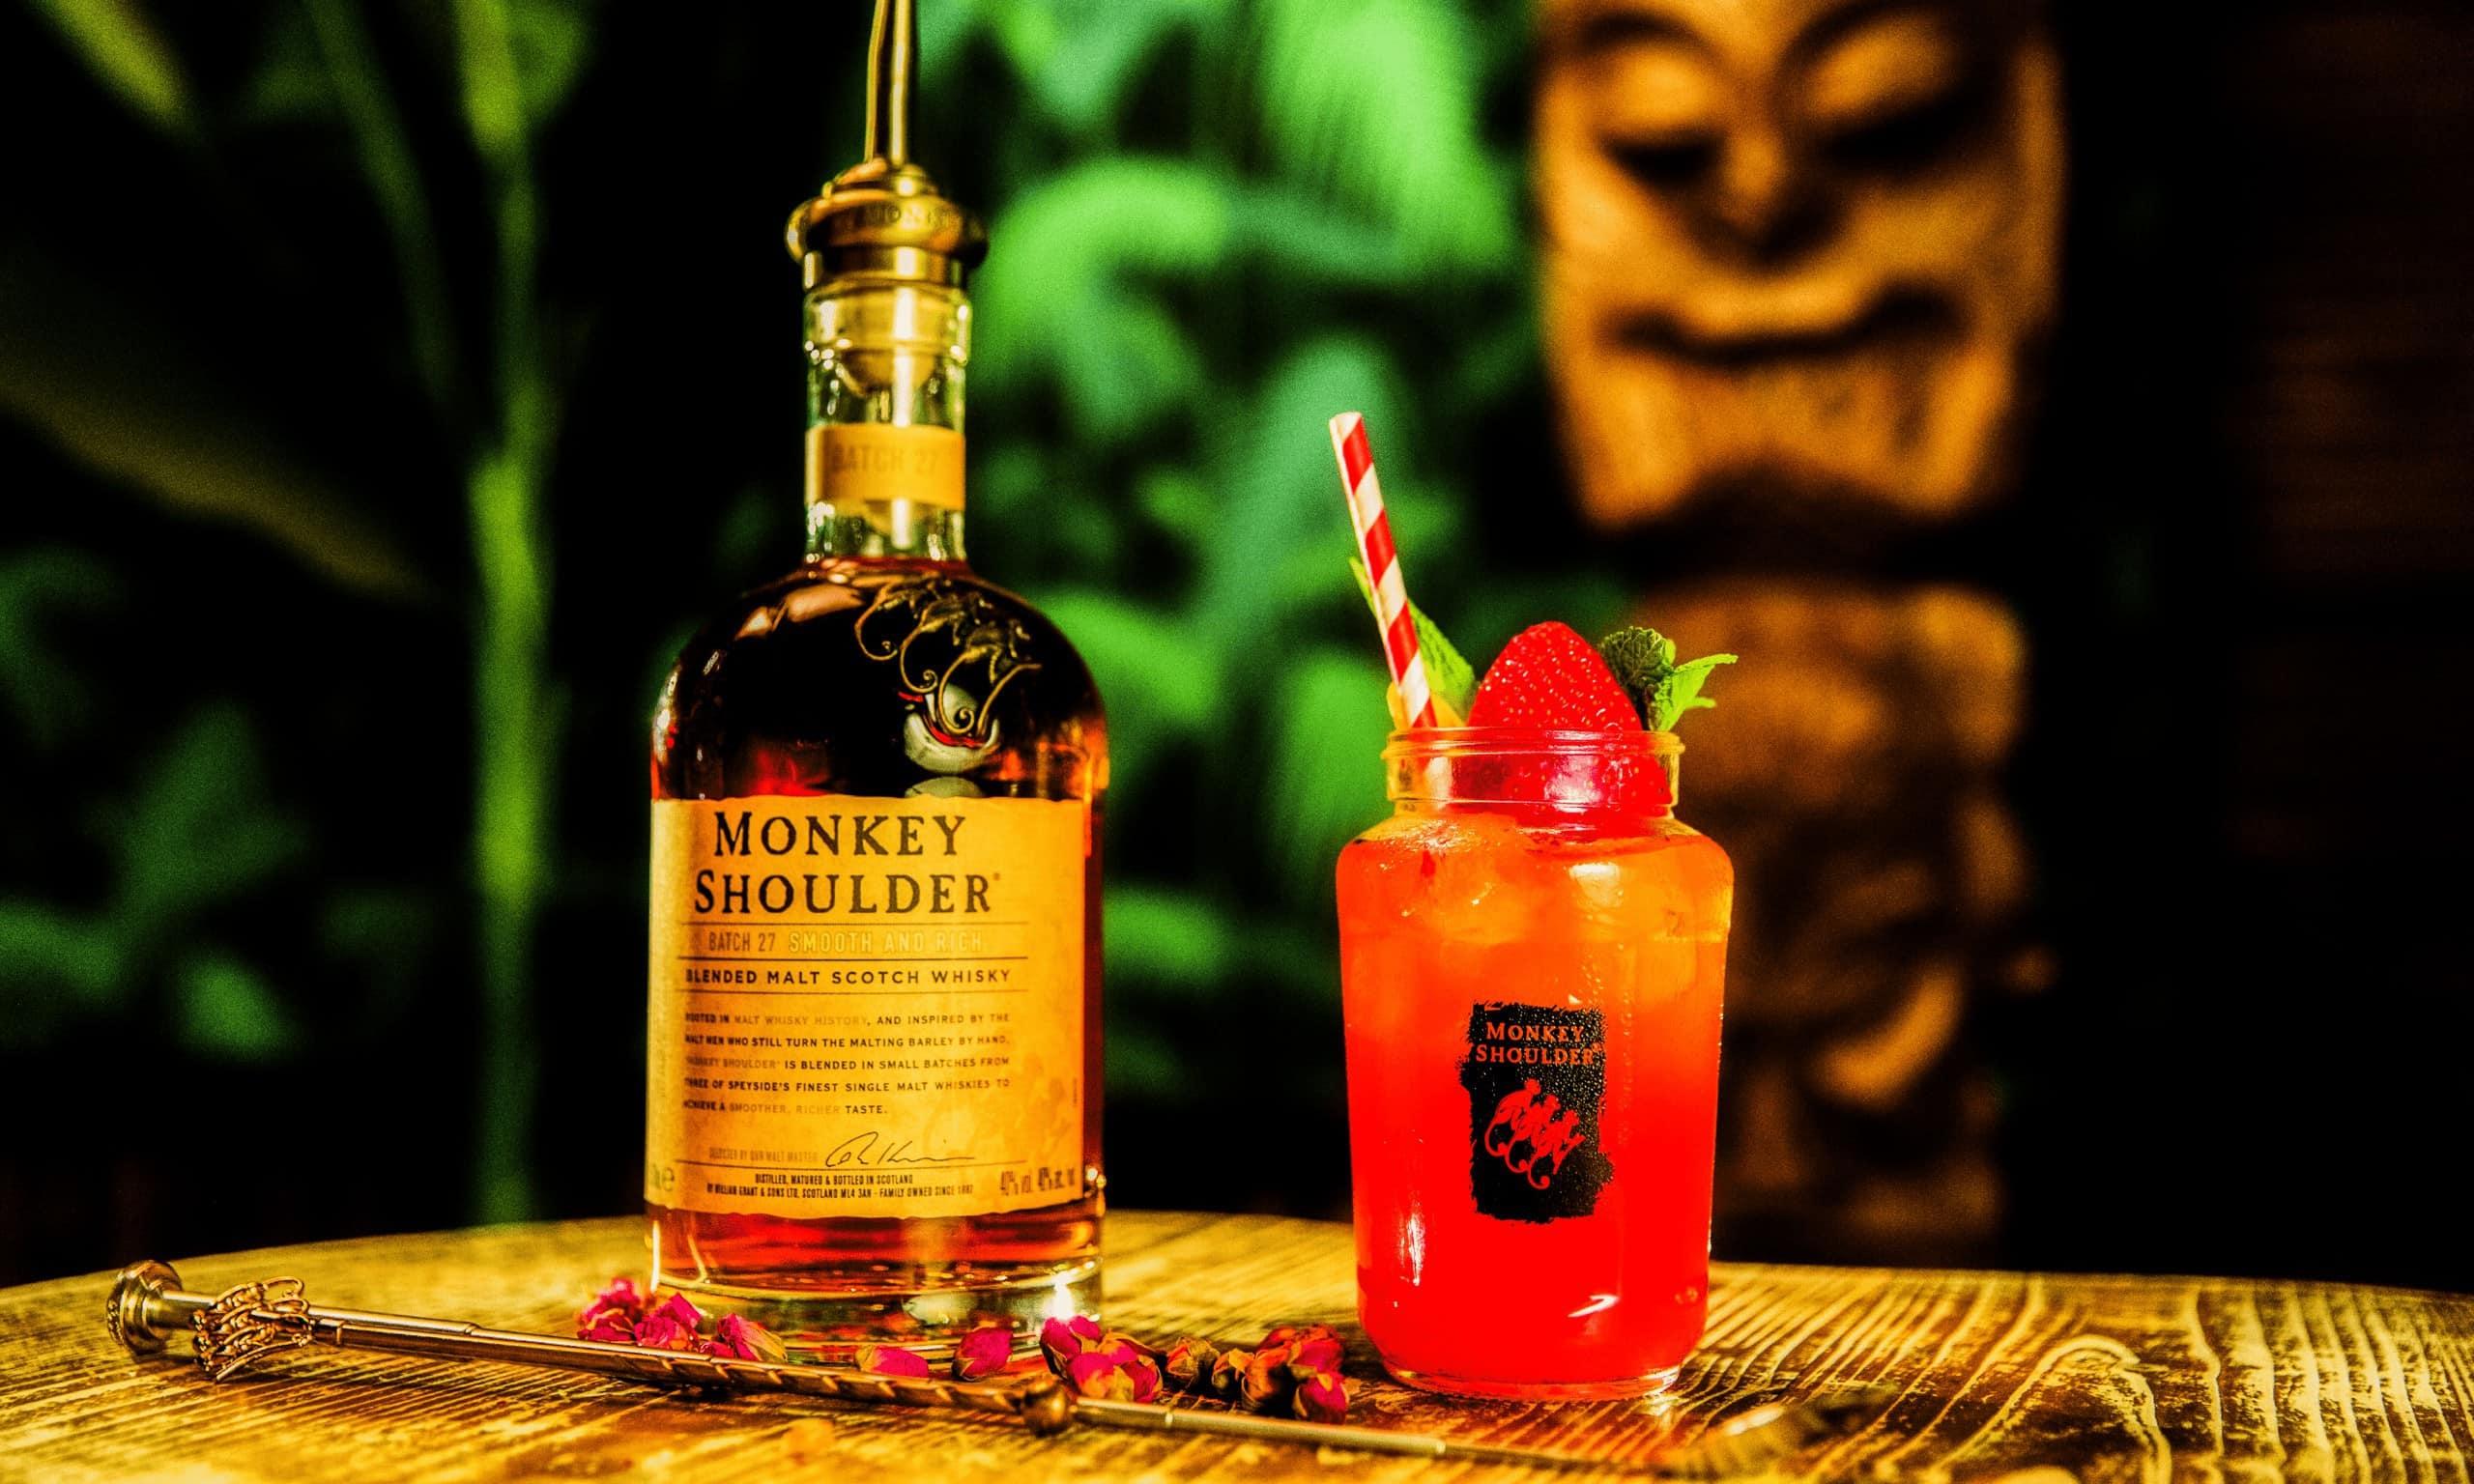 Monkey shoulder whiskey served cold.